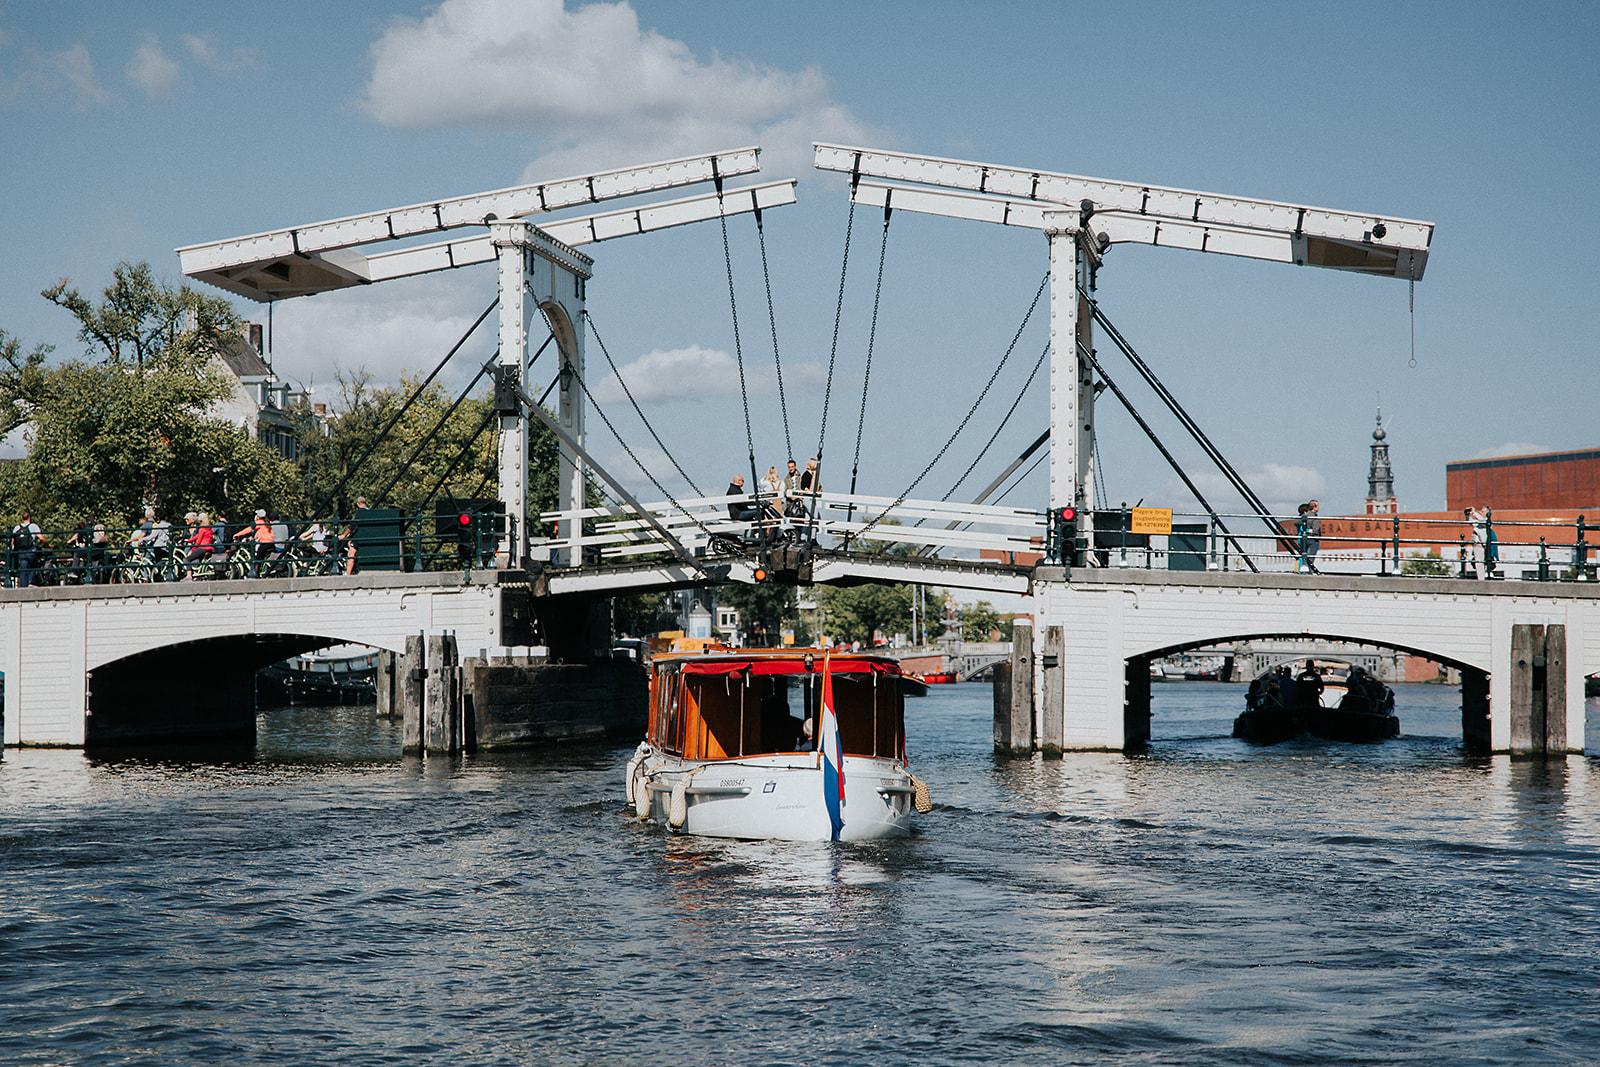 180913_AmsterdamBoothuur-6_websize.jpg